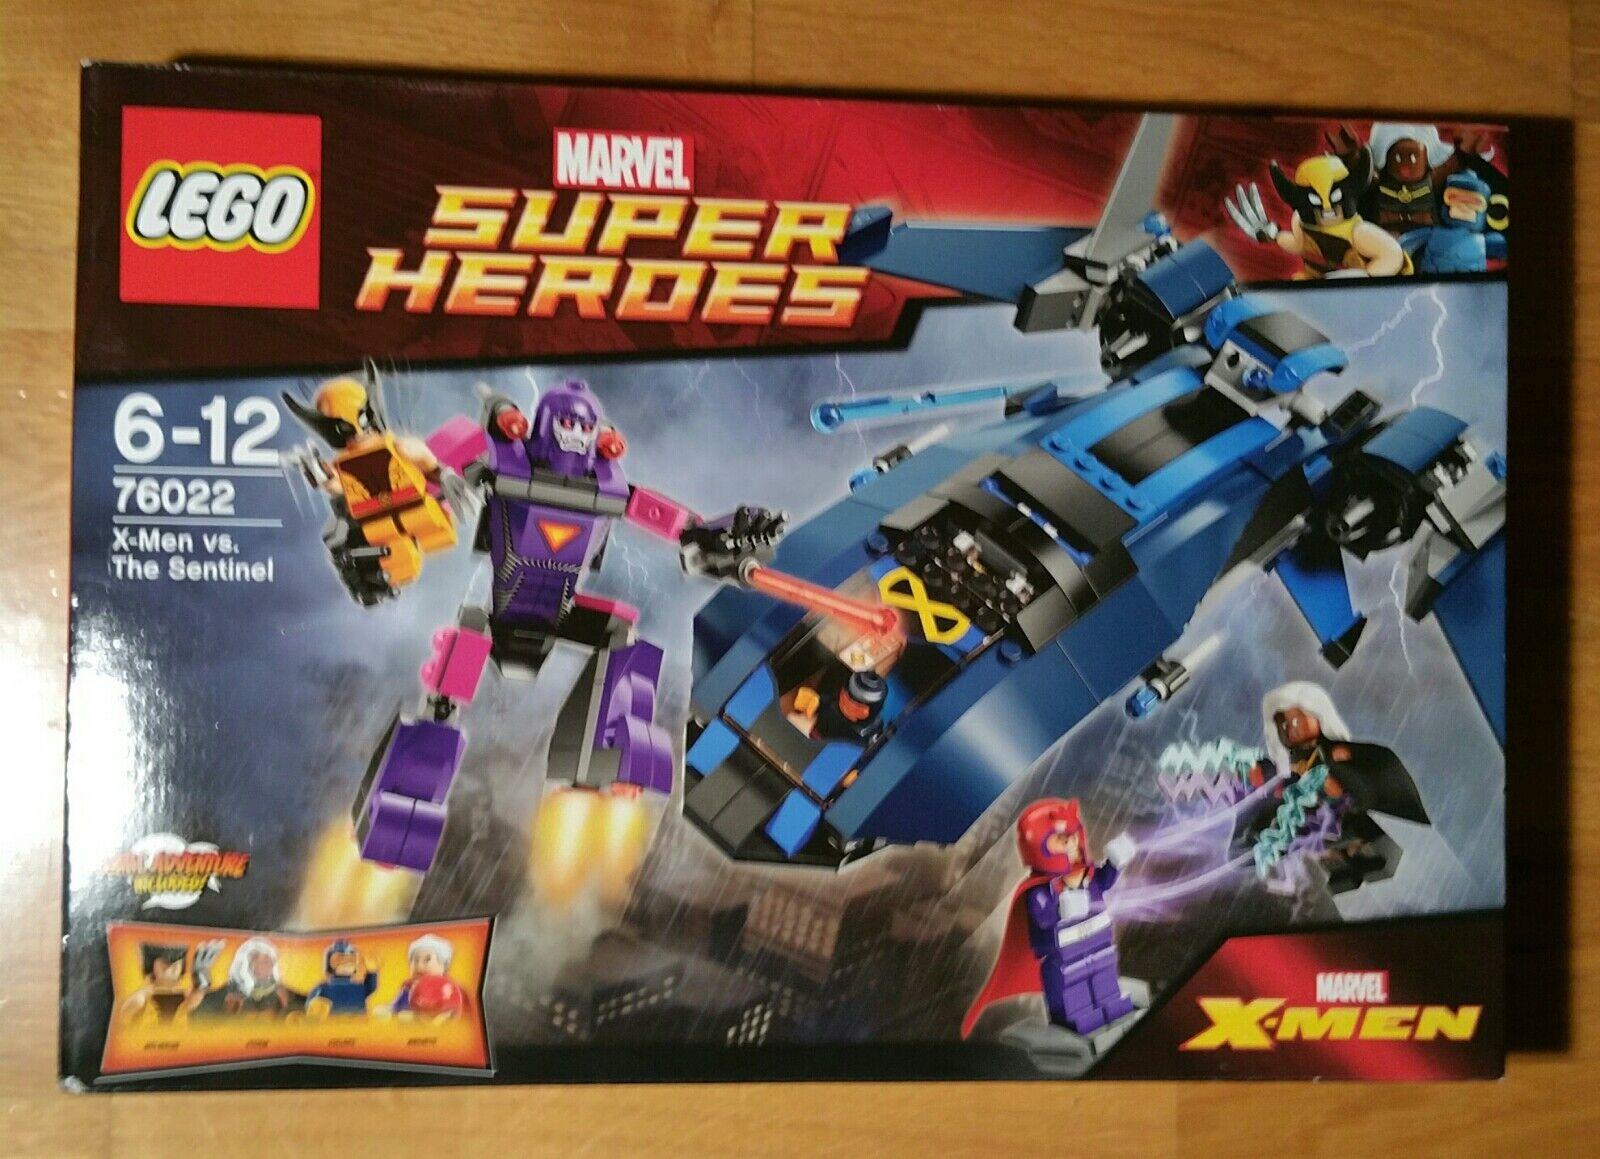 New LEGO 76022 marvel Super Heroes Xmen vs sentinel misb